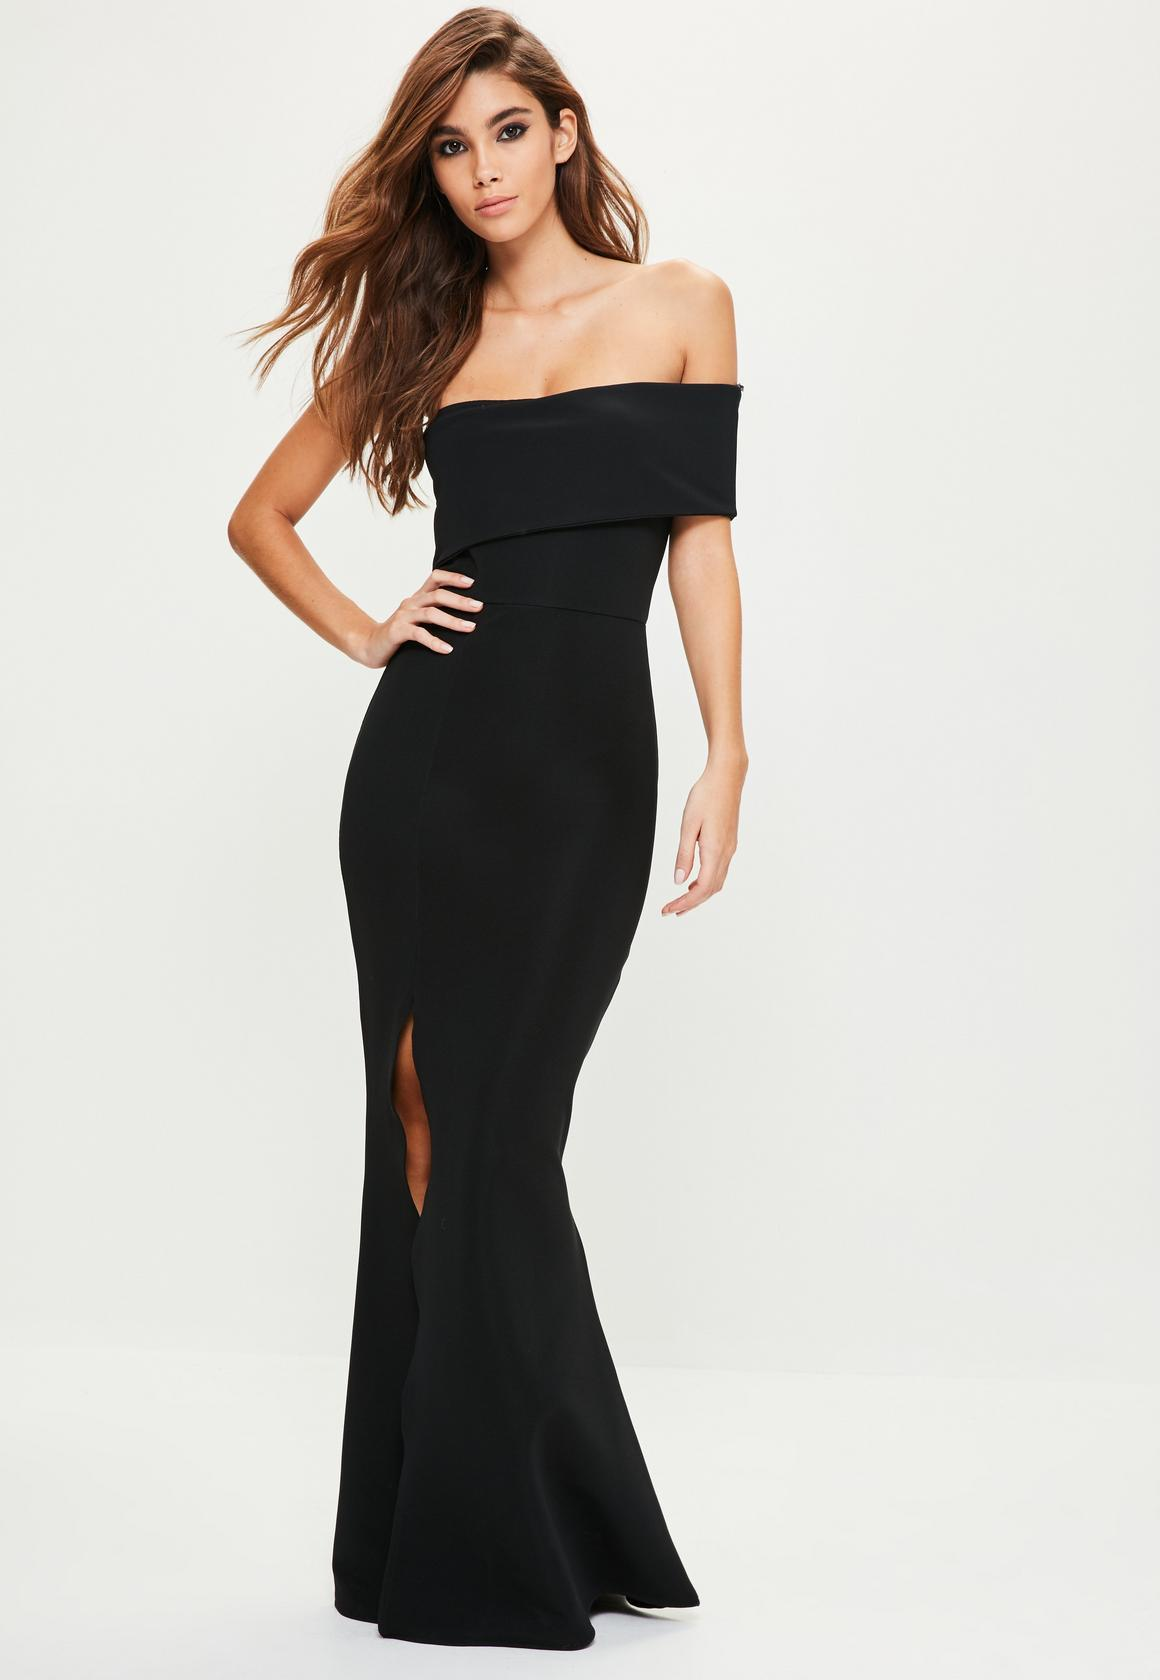 Robe longue noir fendue